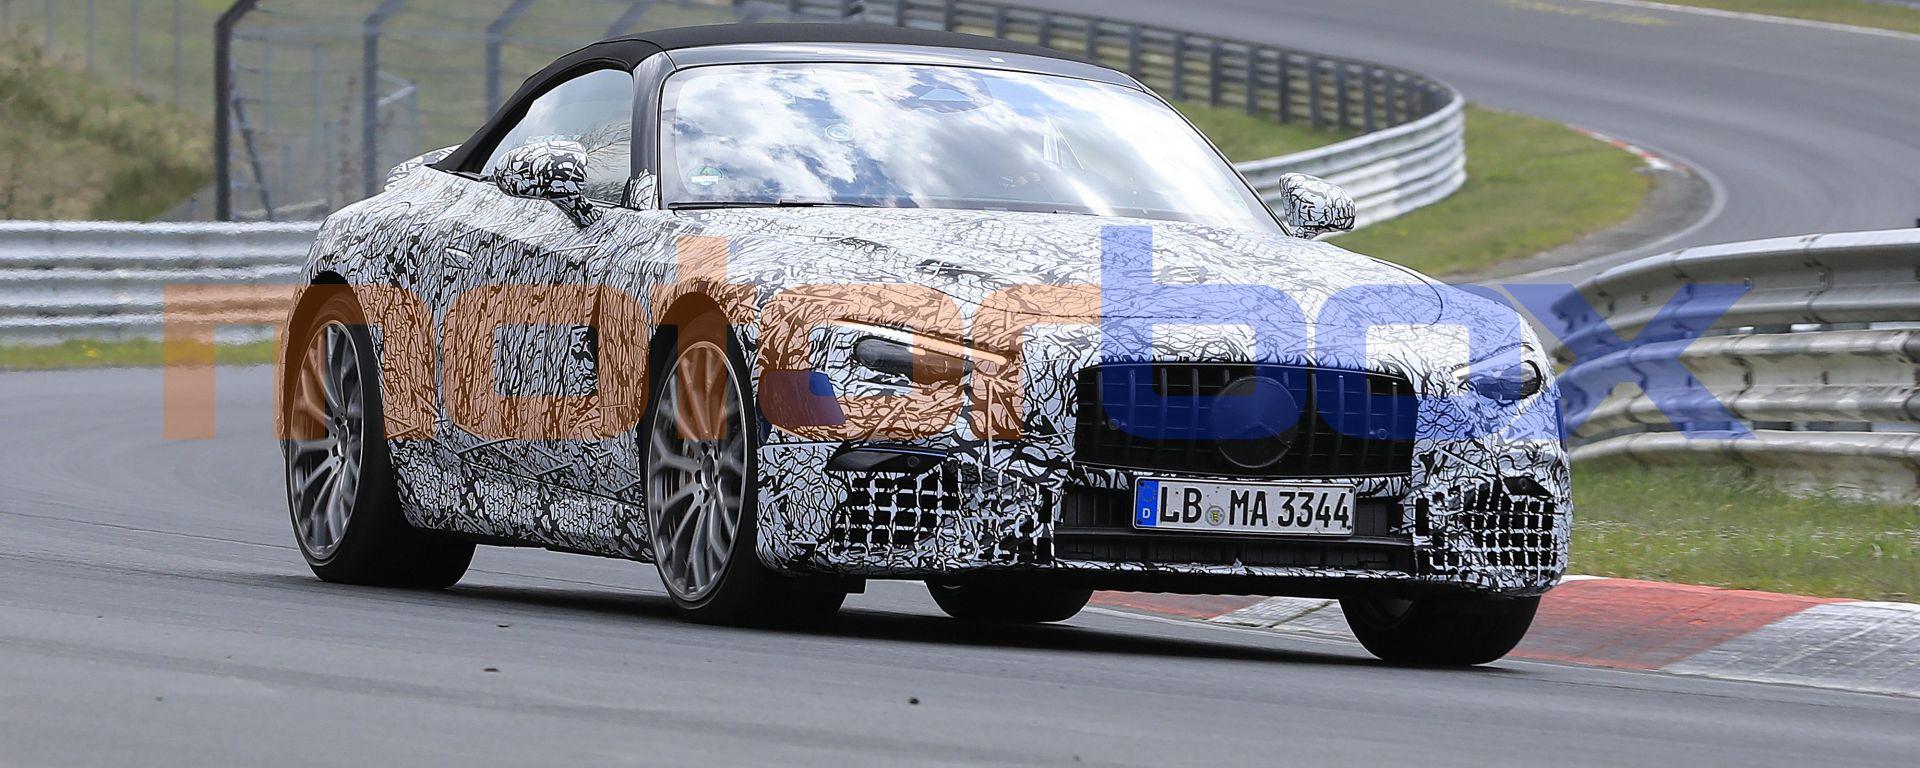 Nuova Mercedes SL 2021: i test dinamici al Nurburgring